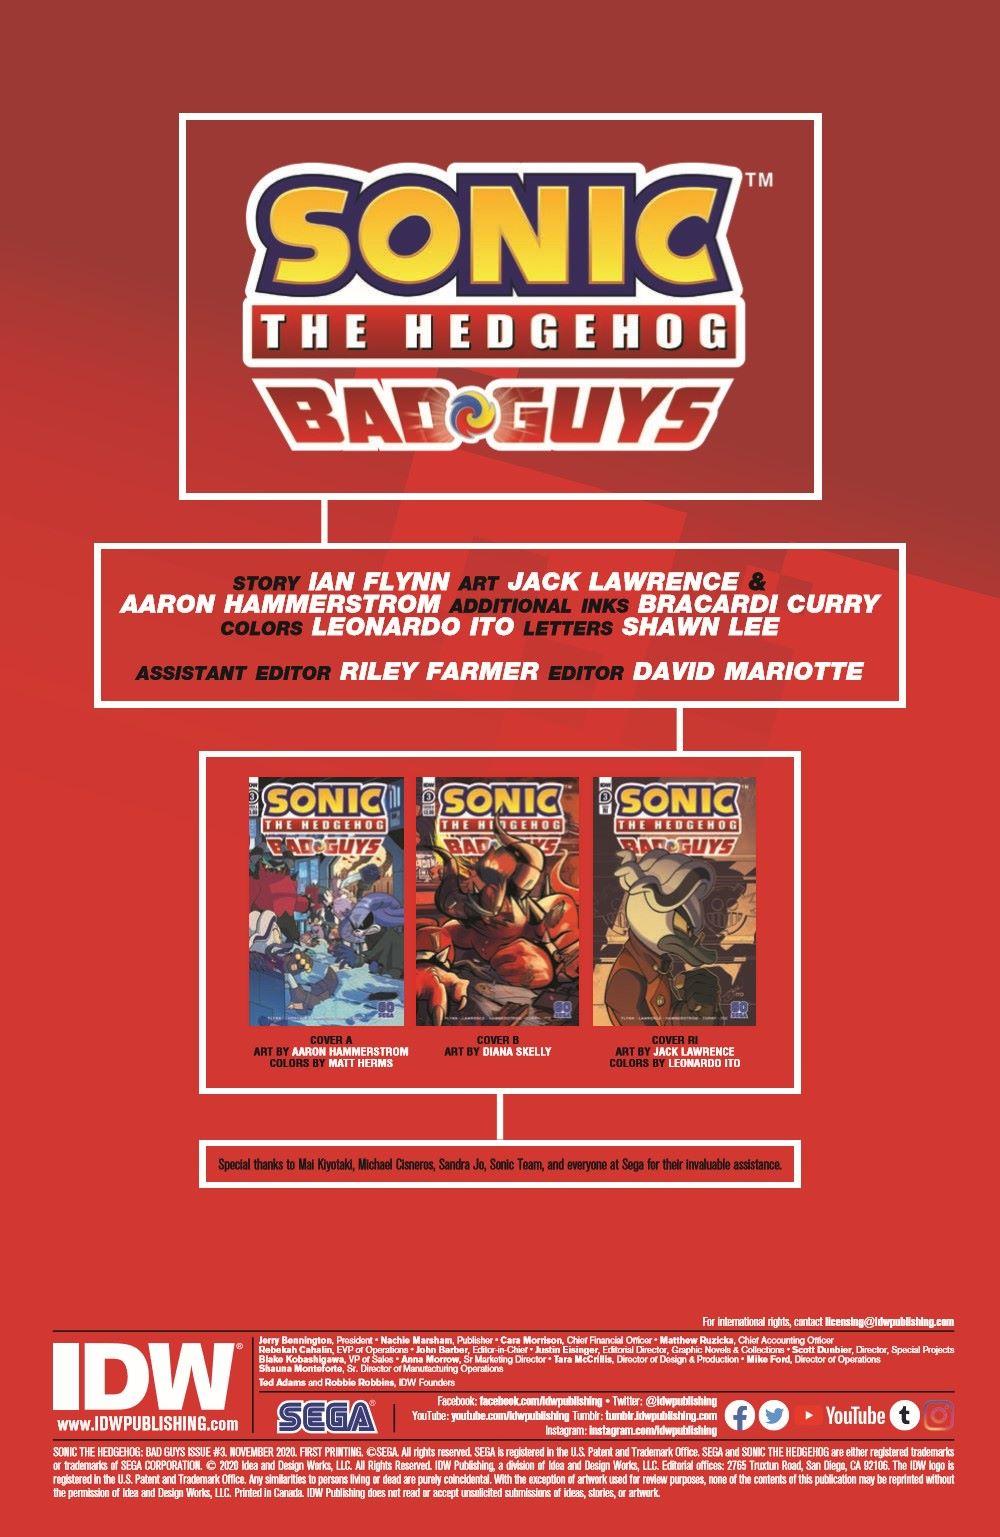 STH-BG03_pr-2 ComicList Previews: SONIC THE HEDGEHOG BAD GUYS #3 (OF 4)